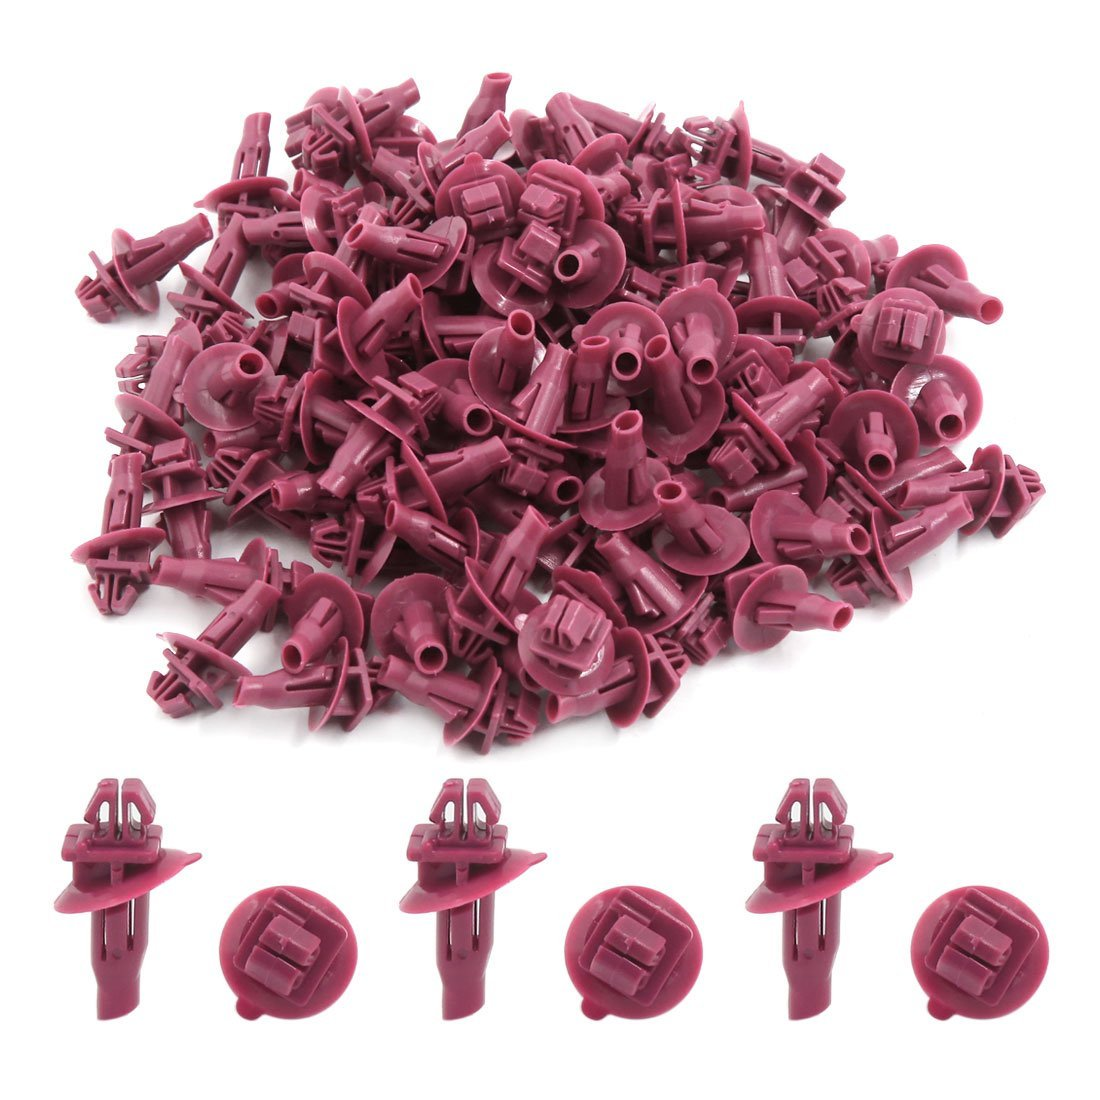 Amazon.com: eDealMax 100pcs 8 x 11 mm Tamaño del agujero remaches plásticos rojos Recorte de tornillos auto de choque Empuje Clips Para Toyota: Automotive